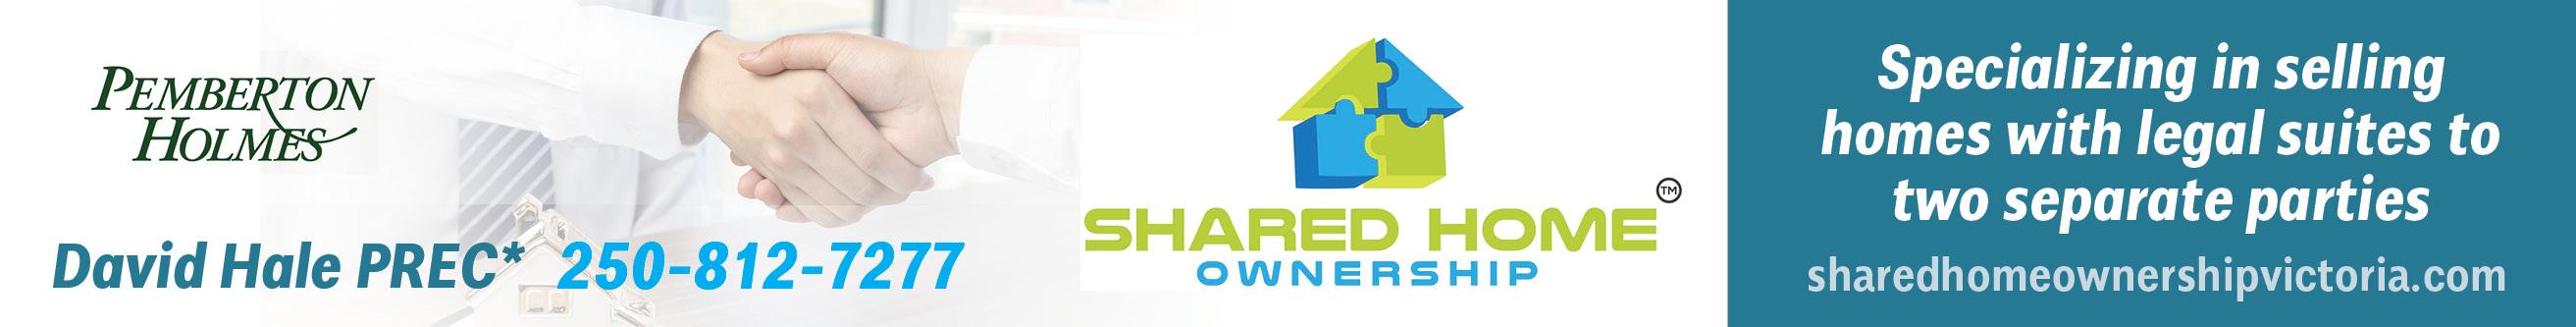 Shared Home Ownership - David Hale